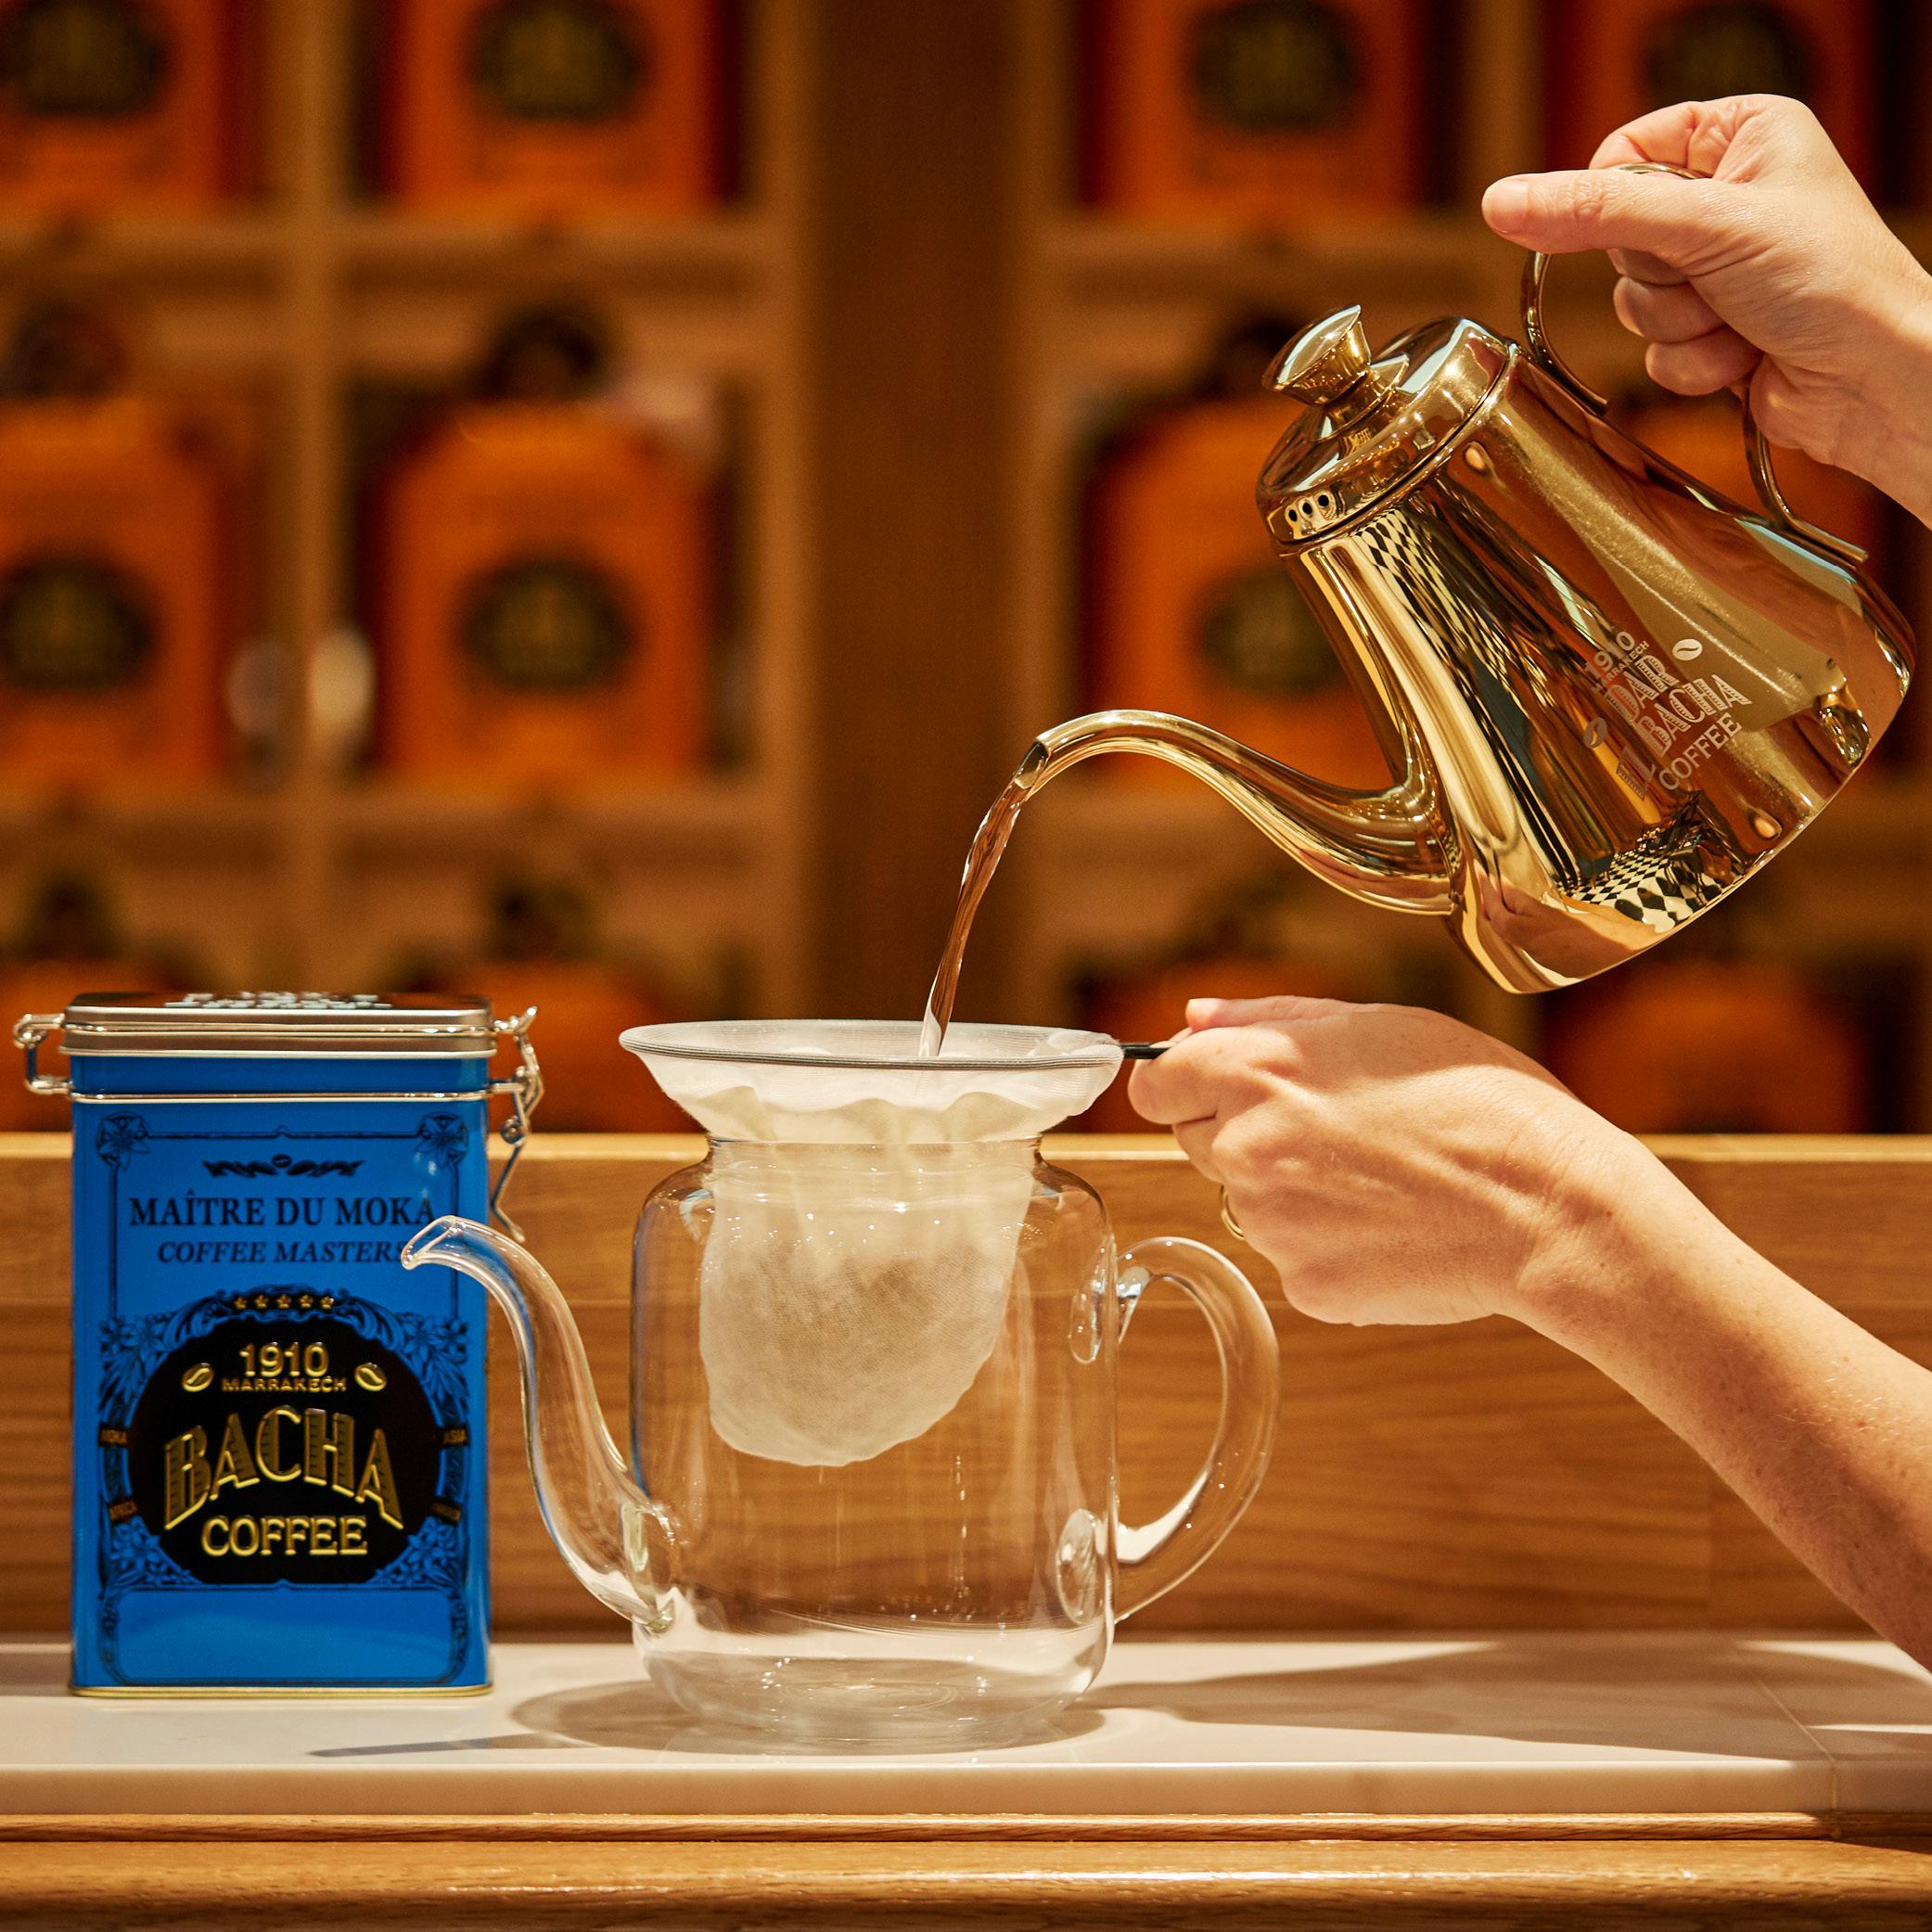 bacha-coffee-blog-articles-coffee-stories-4